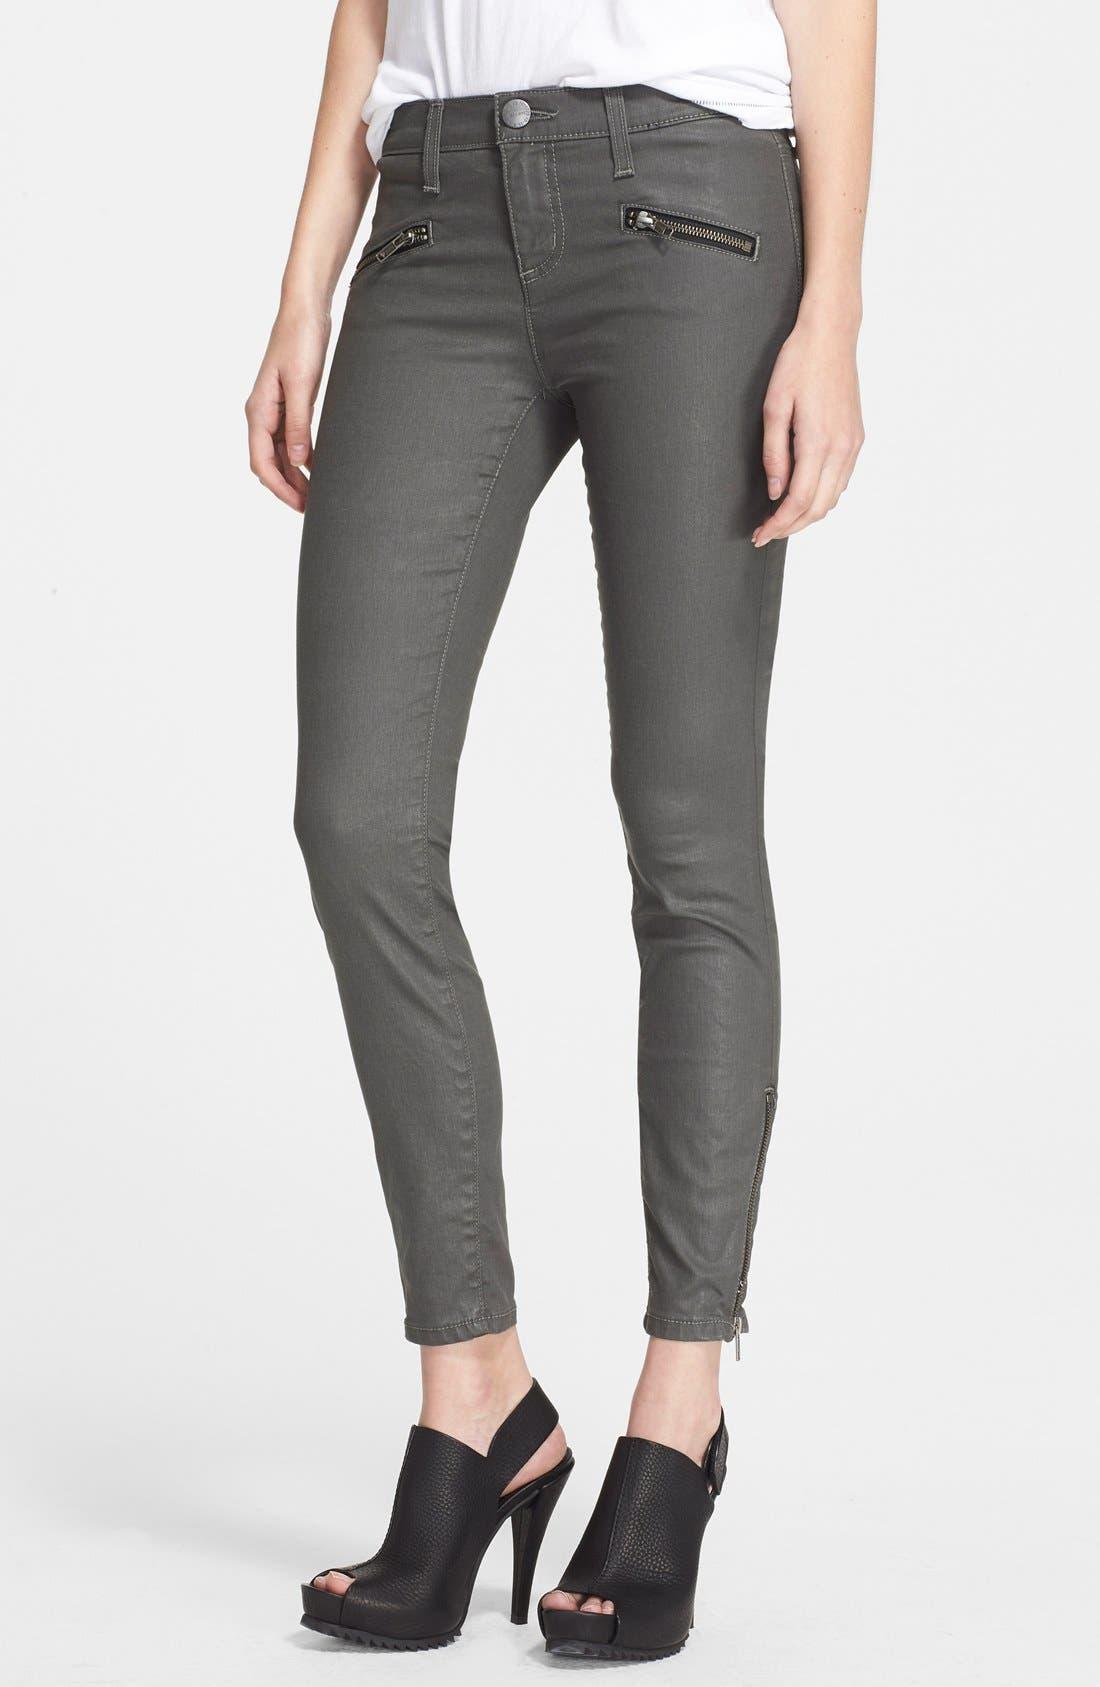 Alternate Image 1 Selected - Current/Elliott 'The Soho Zip' Skinny Jeans (Castle Coated)